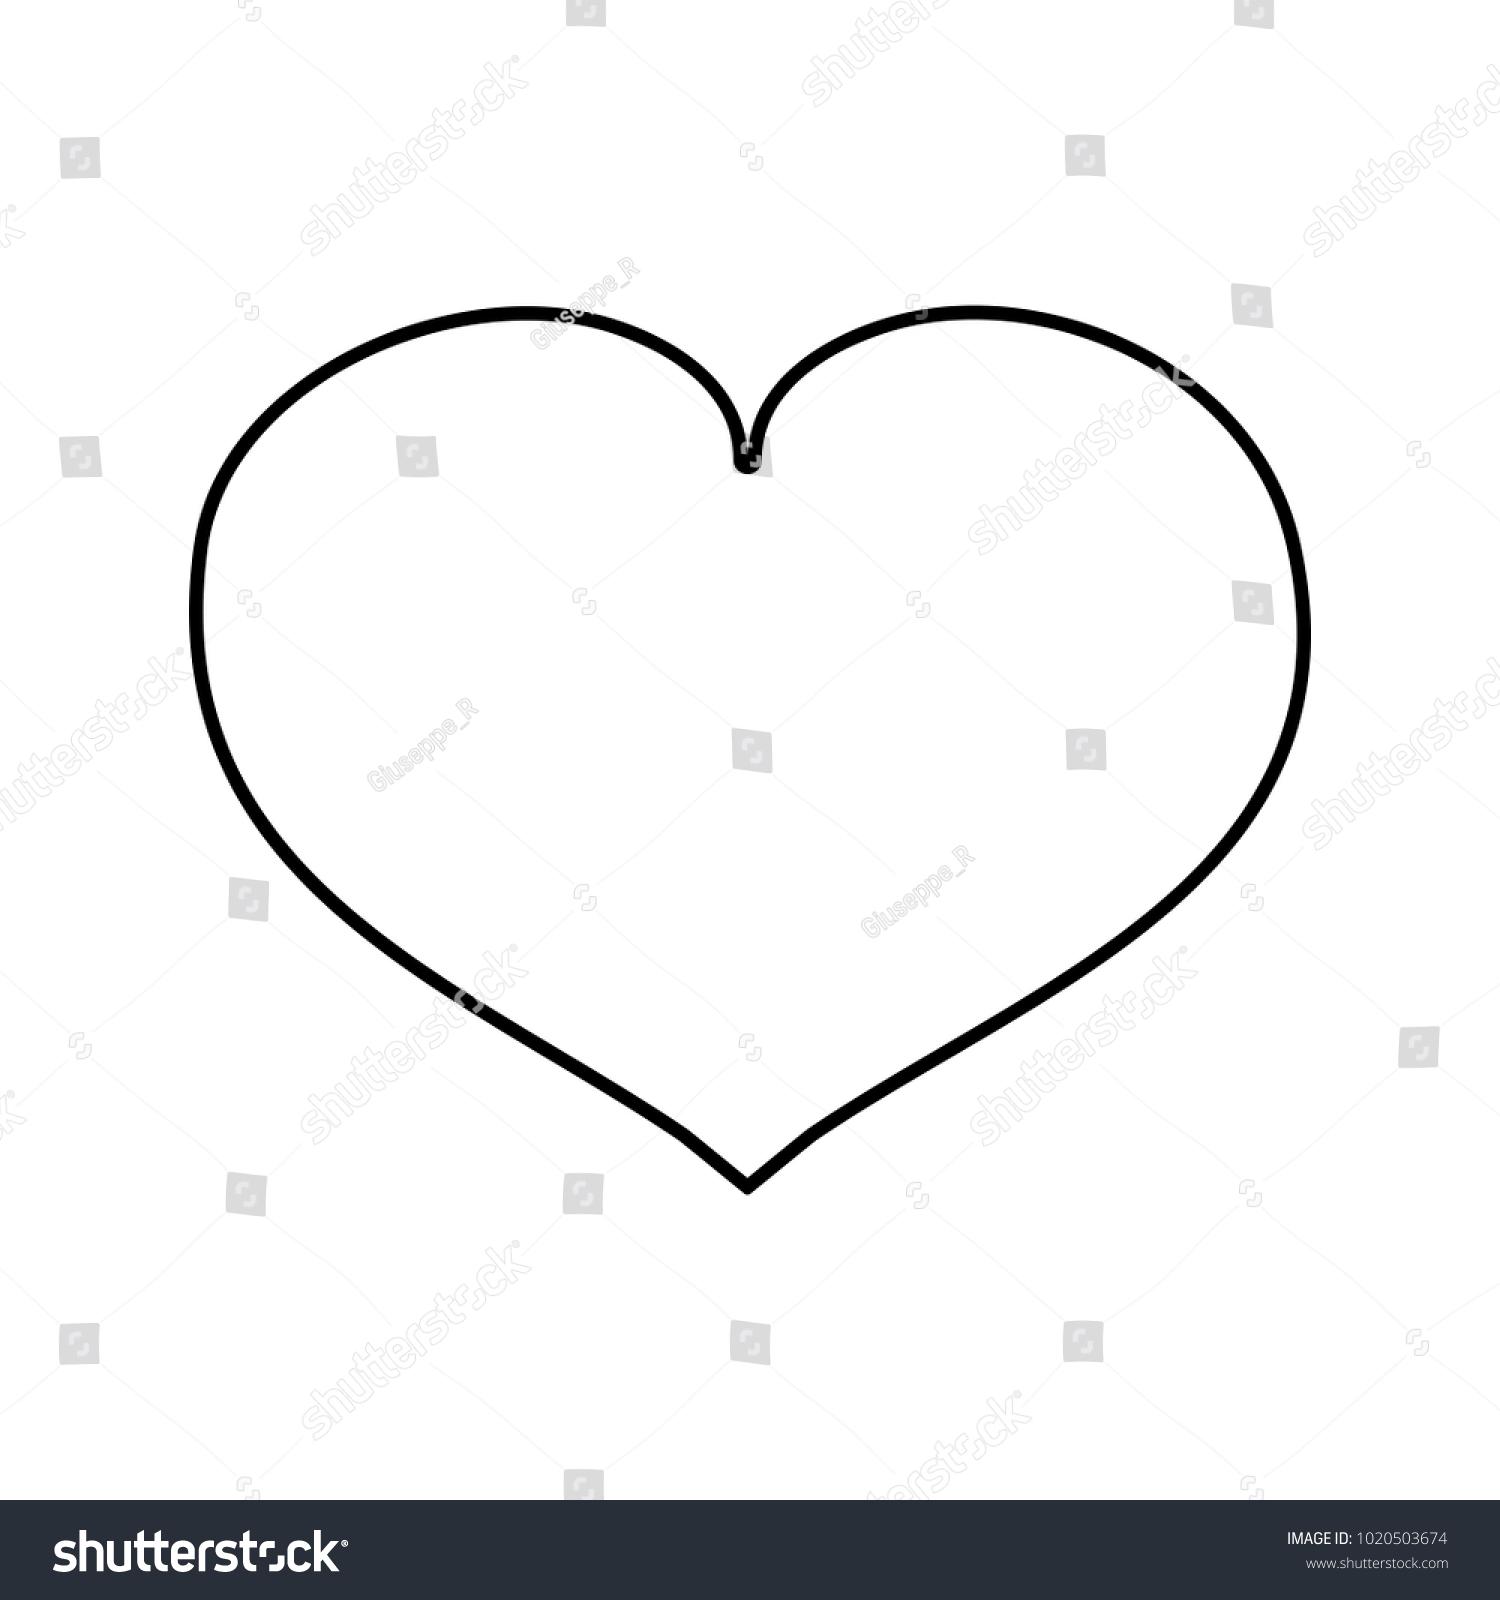 Line Heart Love Symbol Passion Stock Vector 1020503674 Shutterstock